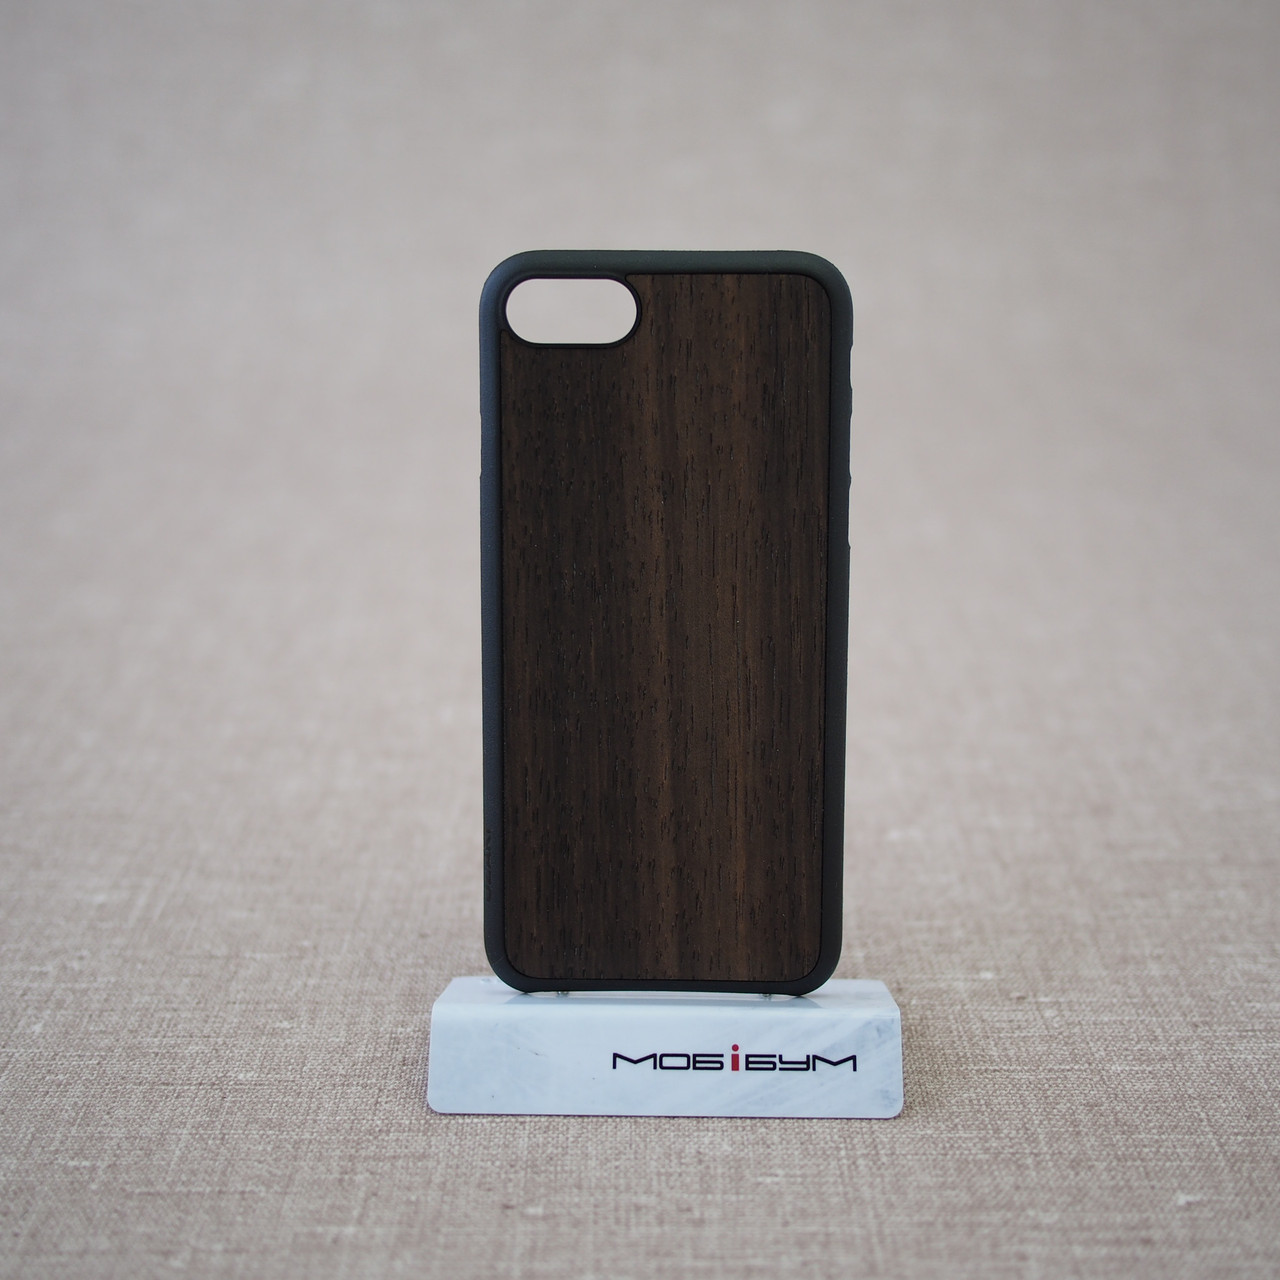 Чехол Ozaki O!coat 0.3 iPhone 7 Jelly+Wood (OC721EC) EAN/UPC: 4718971721027